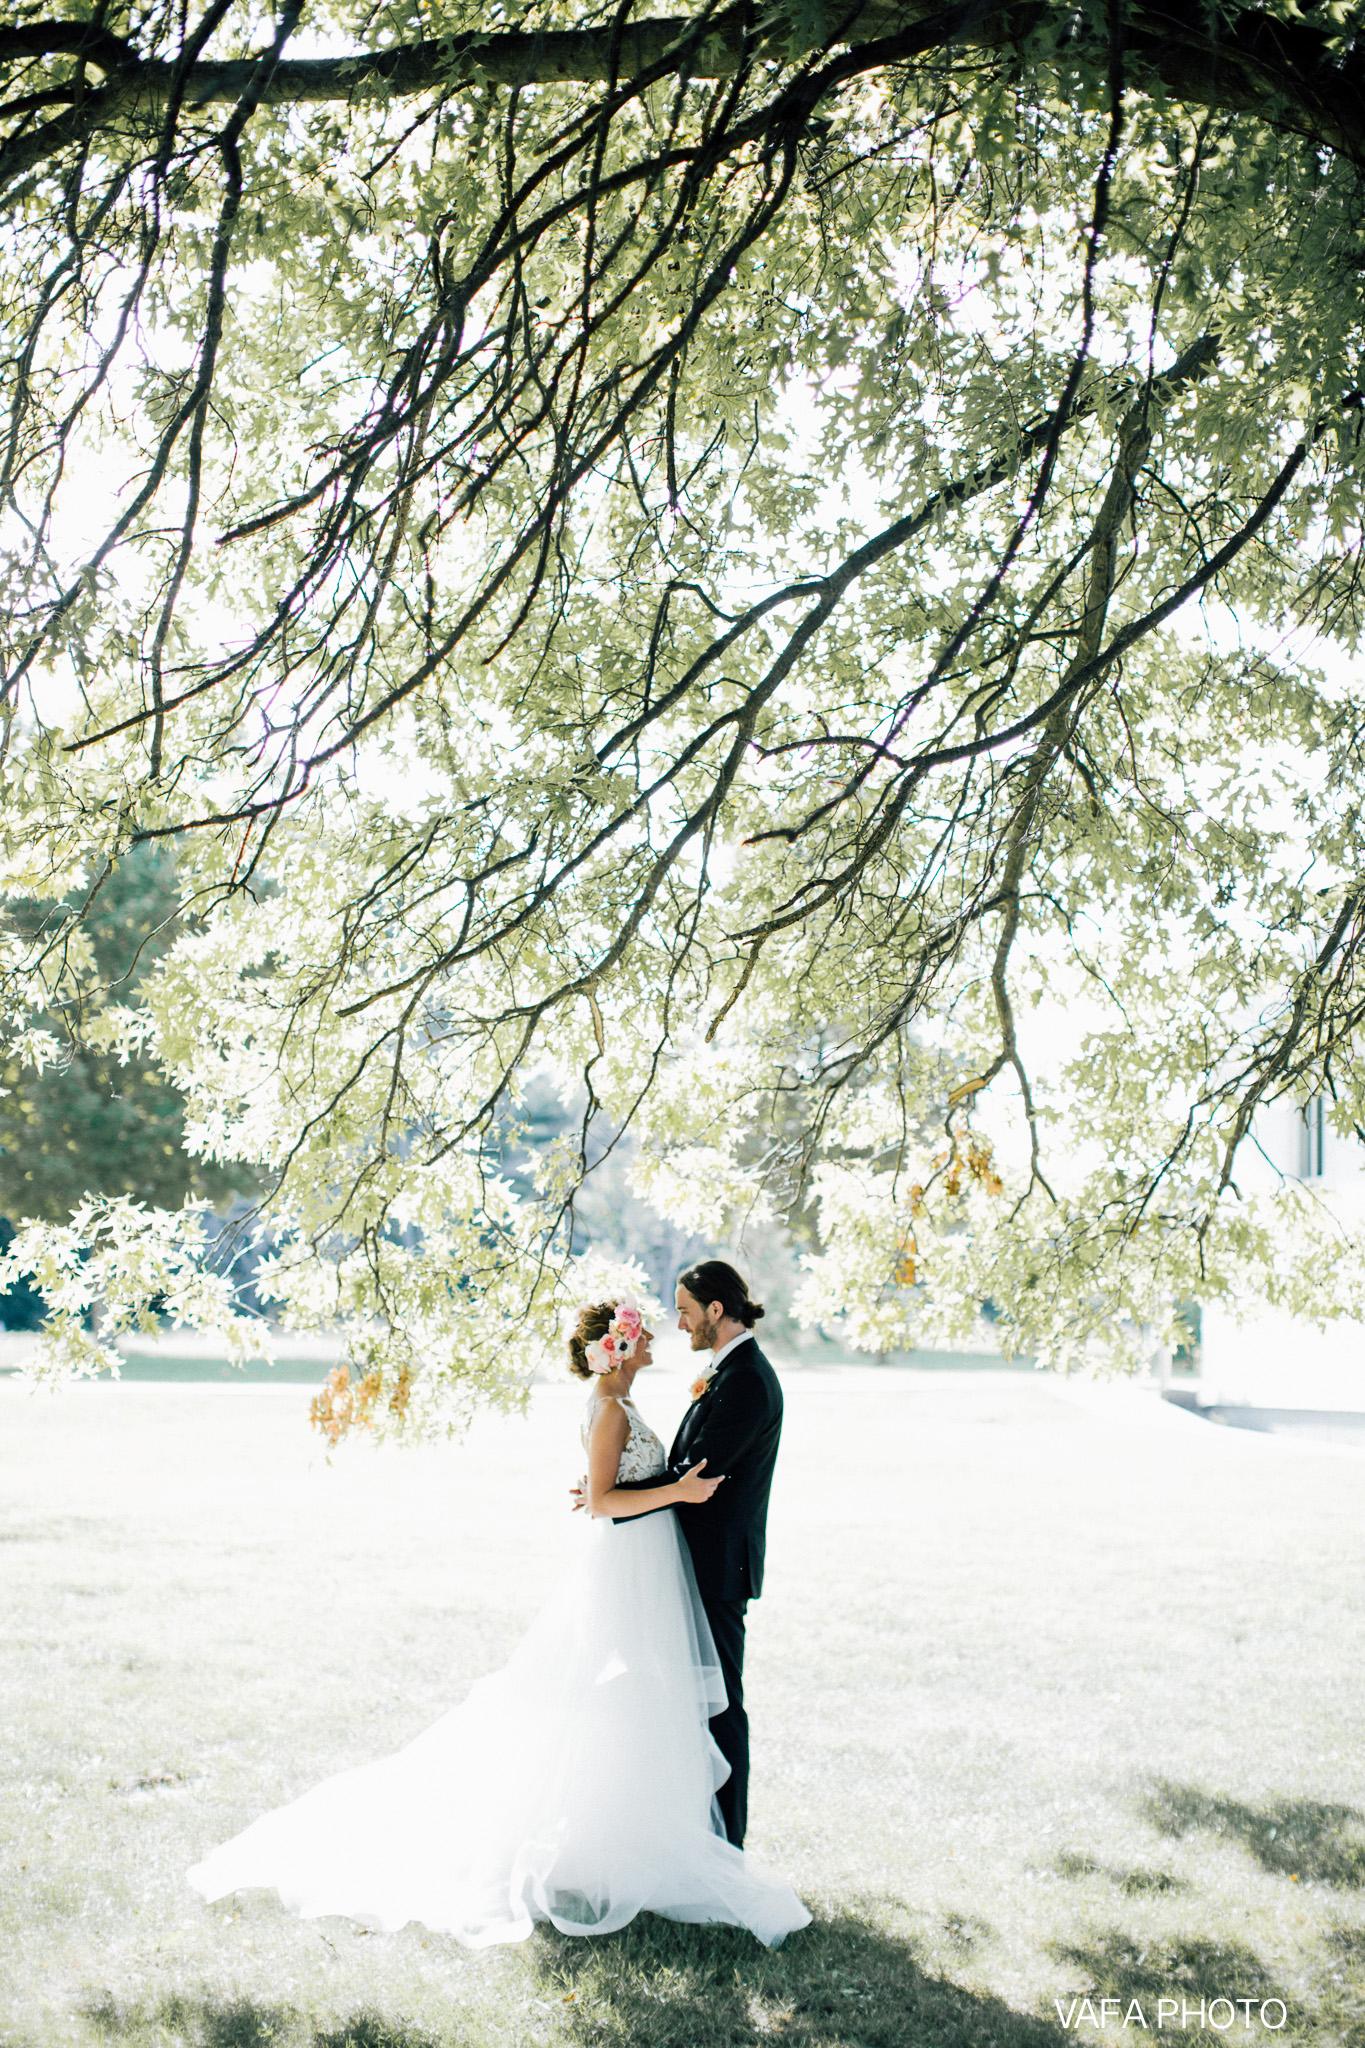 The-Felt-Estate-Wedding-Kailie-David-Vafa-Photo-554.jpg